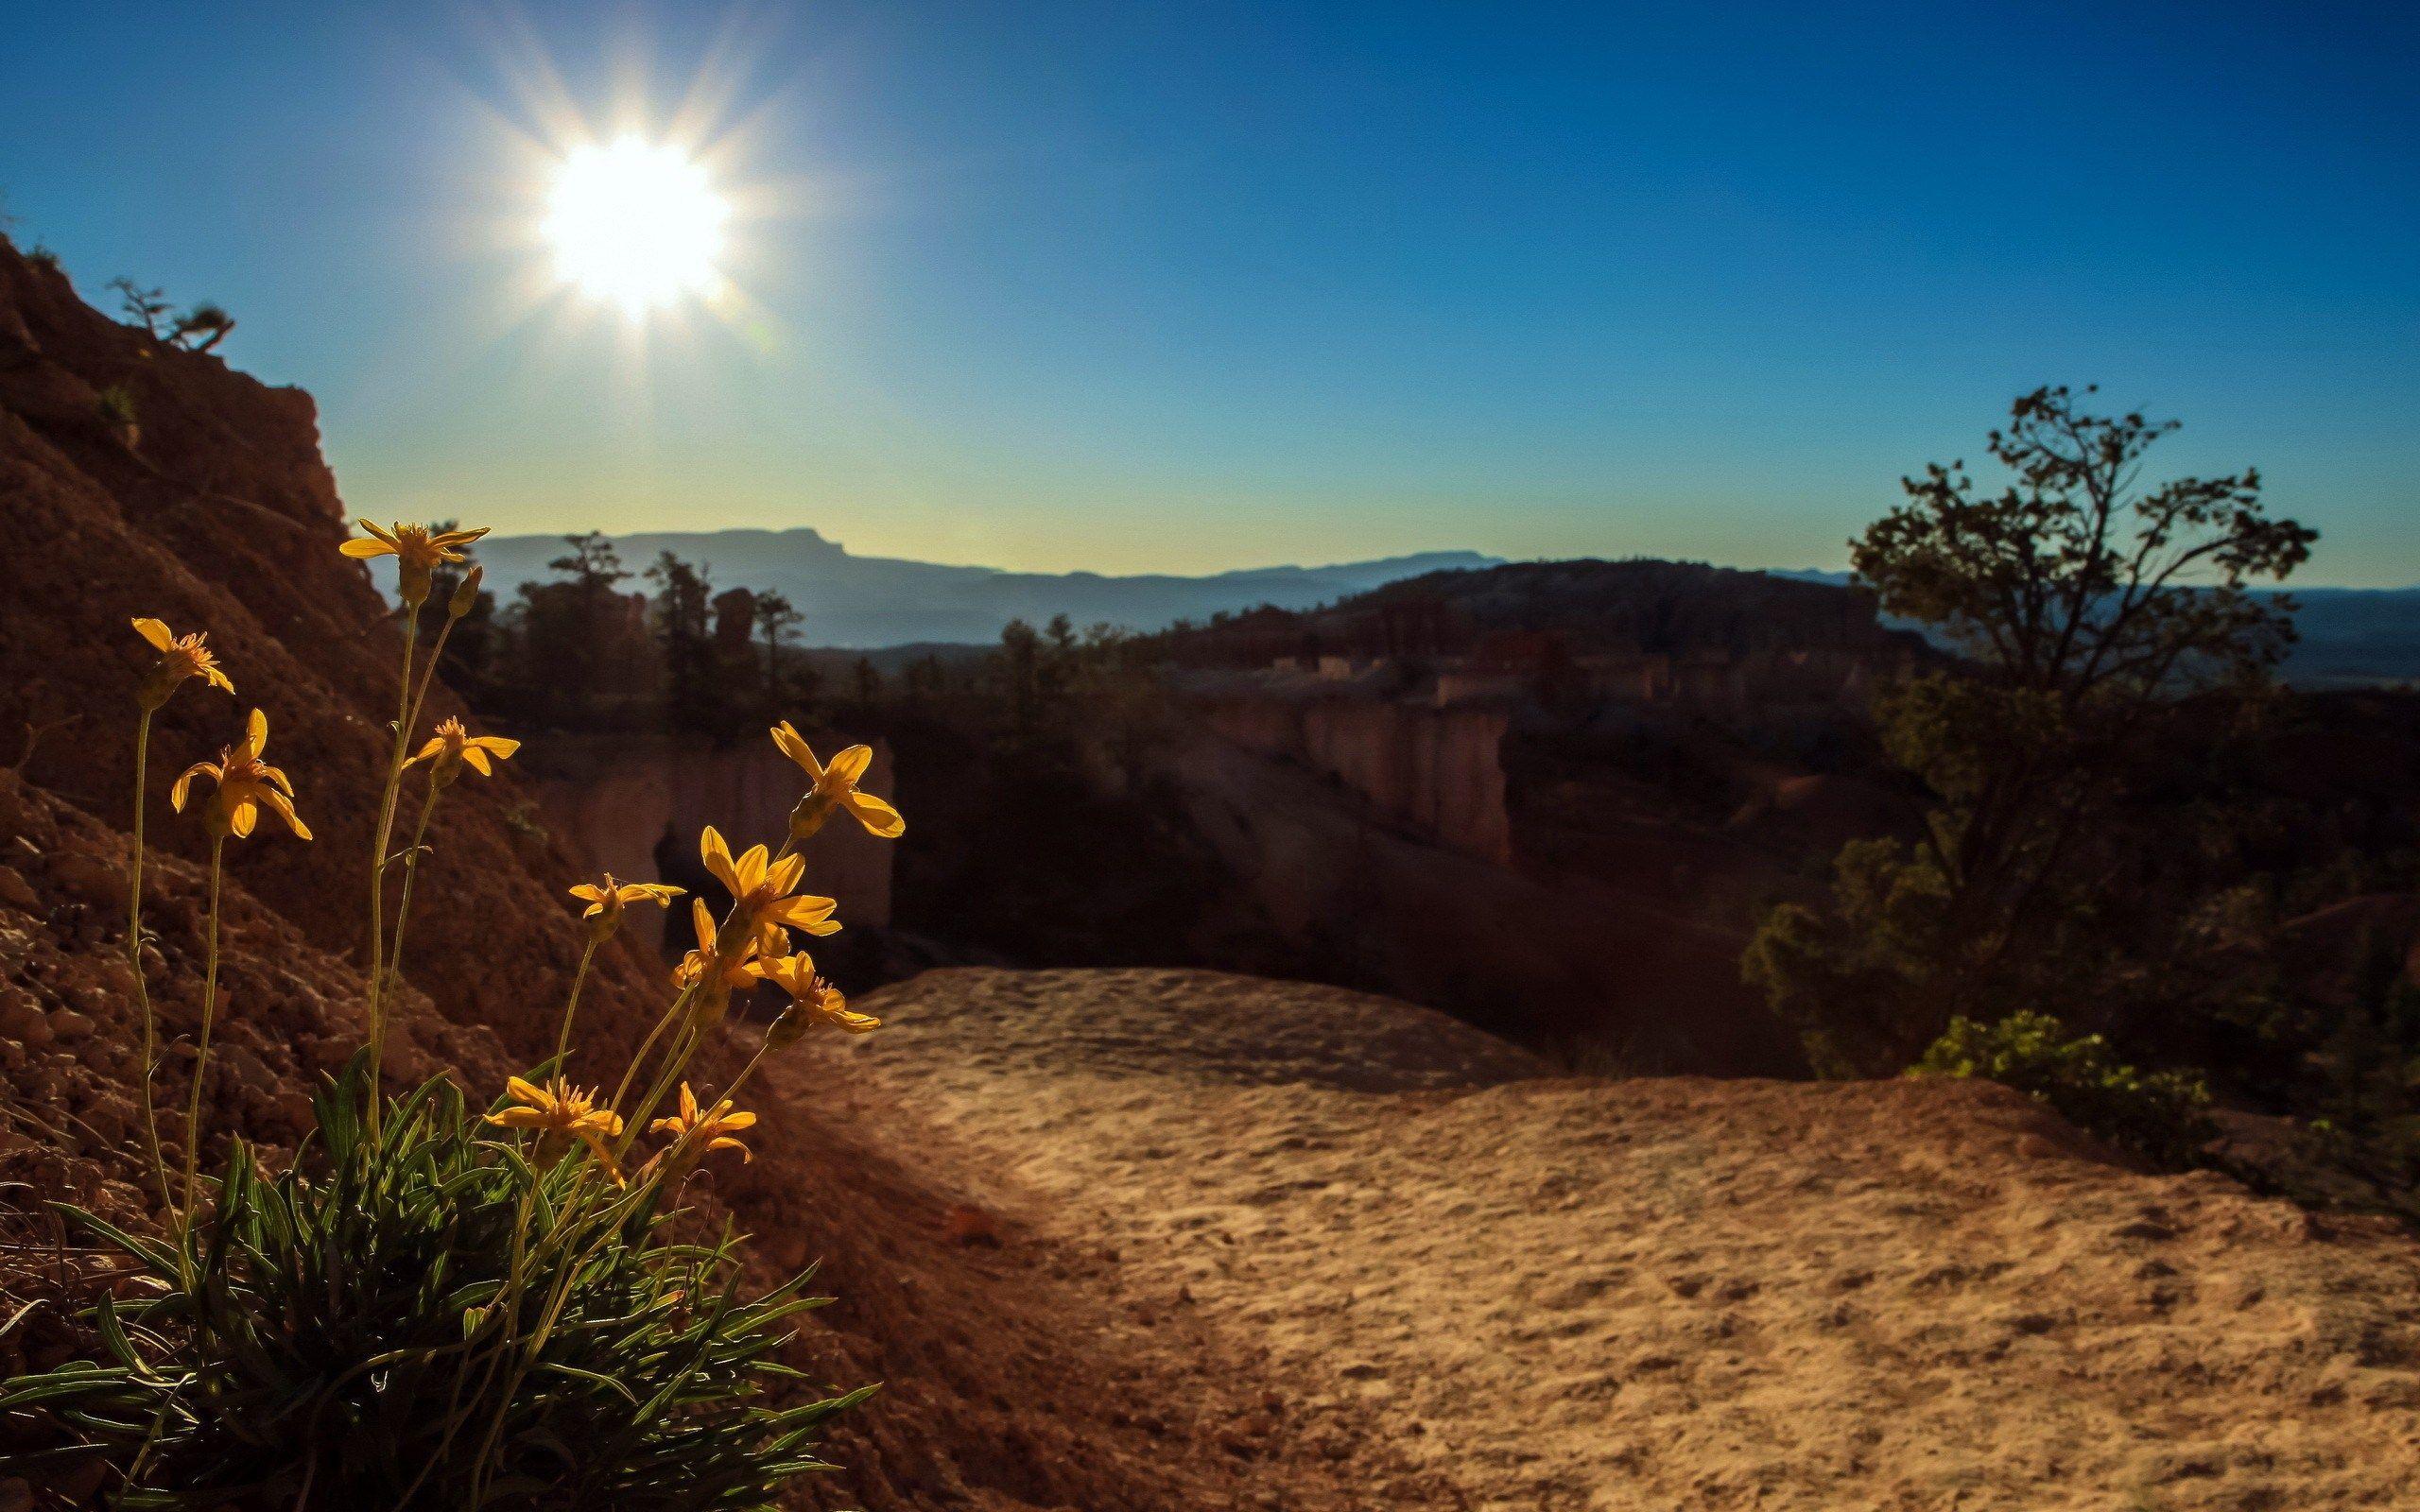 2560x1600 High Resolution Wallpaper Sunbeam Landscape Nature Landscape Photography